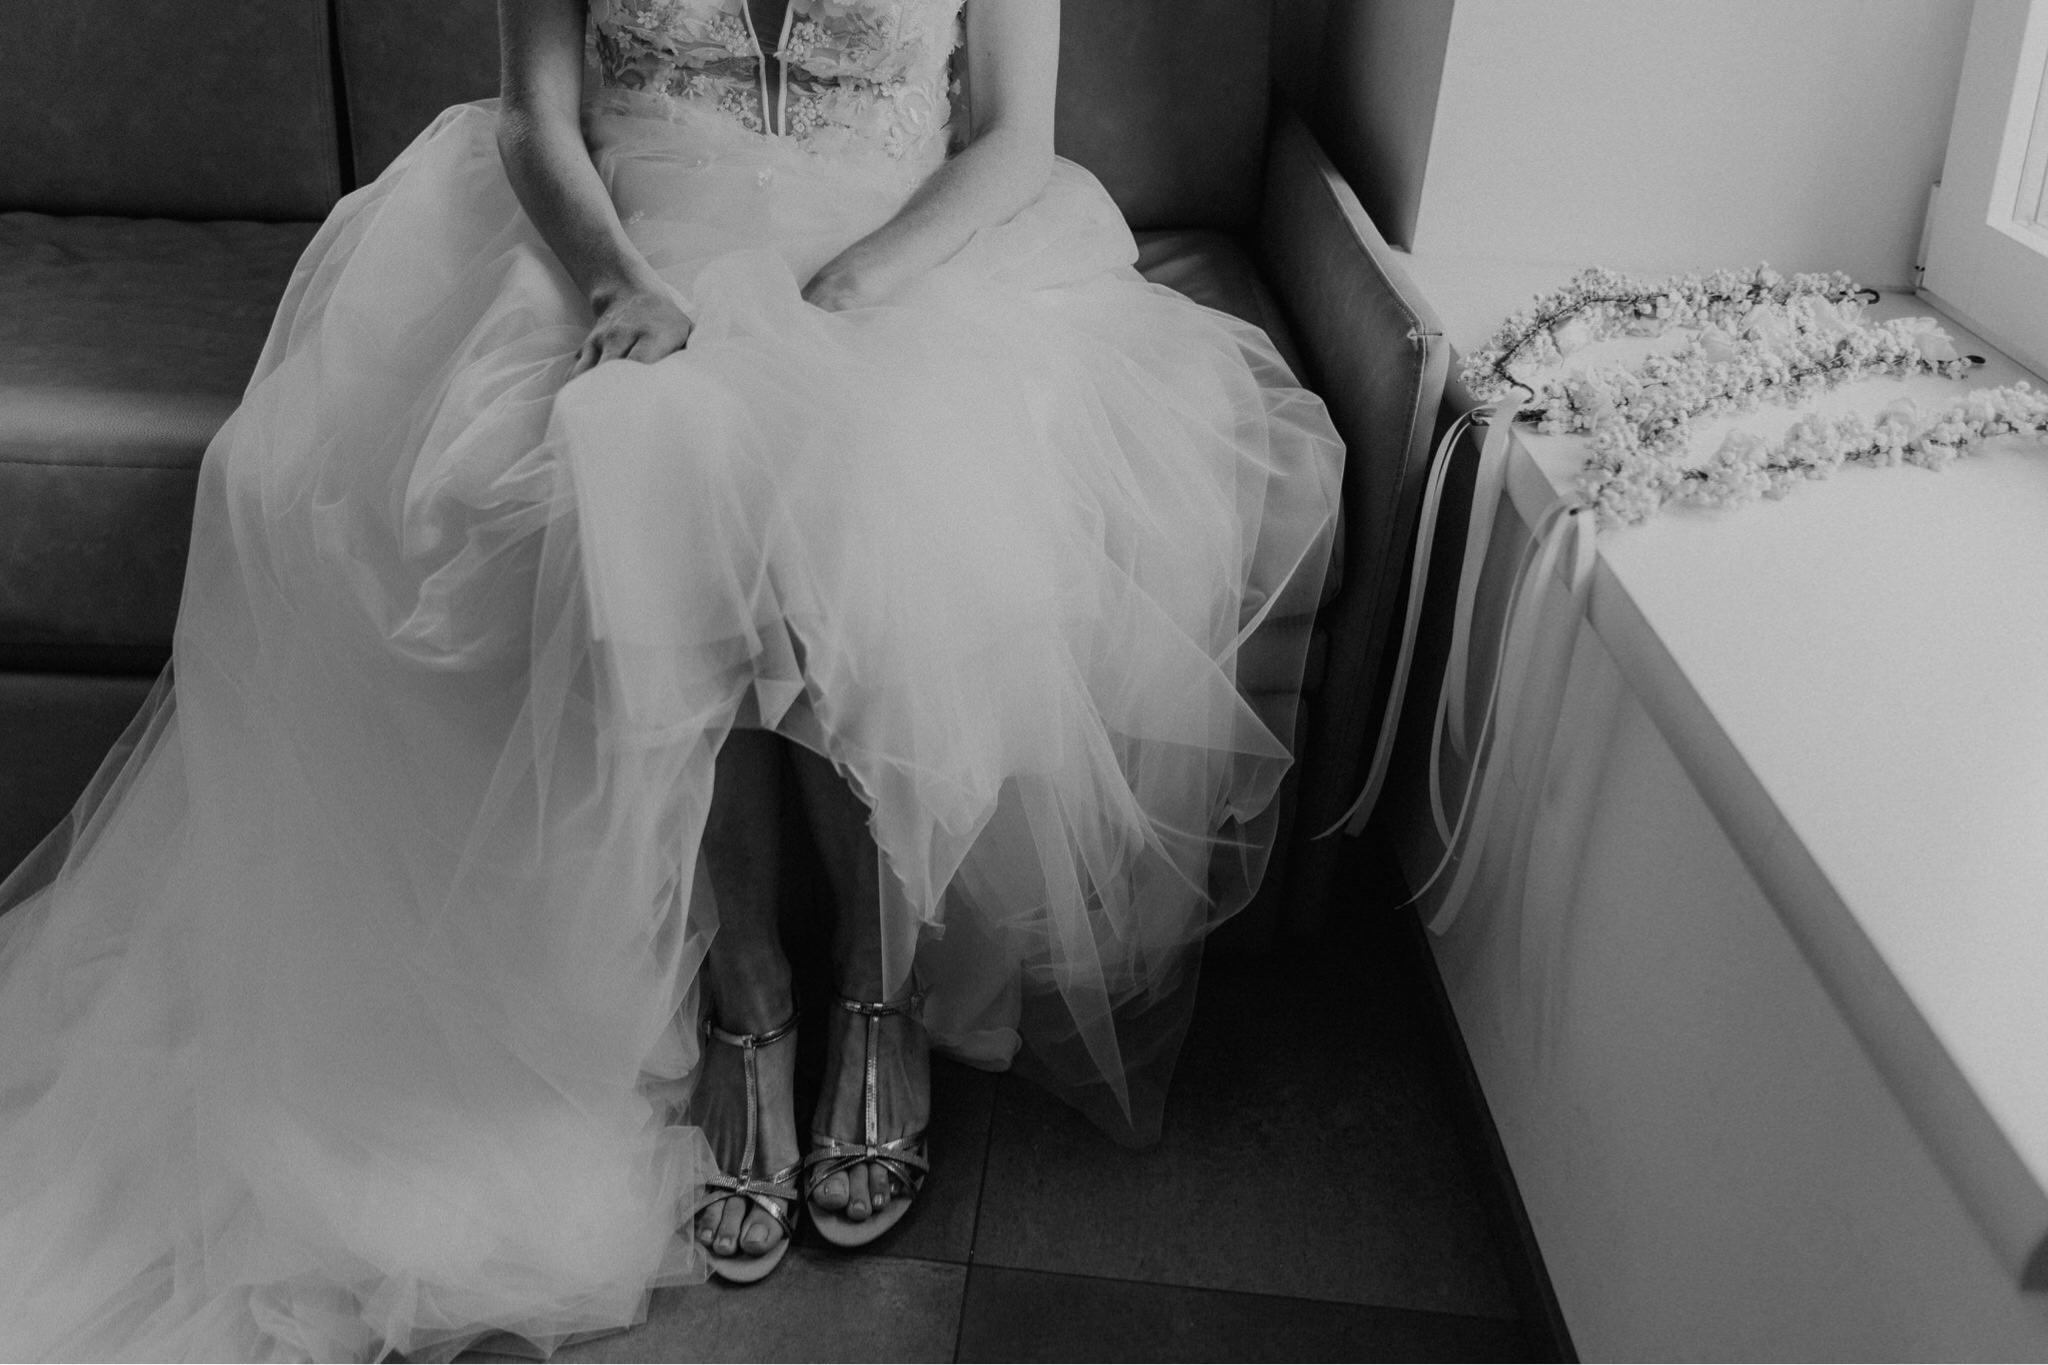 18 la 01 getting ready 1168 weddinphotographer Hochzeitsfotograf newzealand hamilton Weddingphotography Stuttgart 1